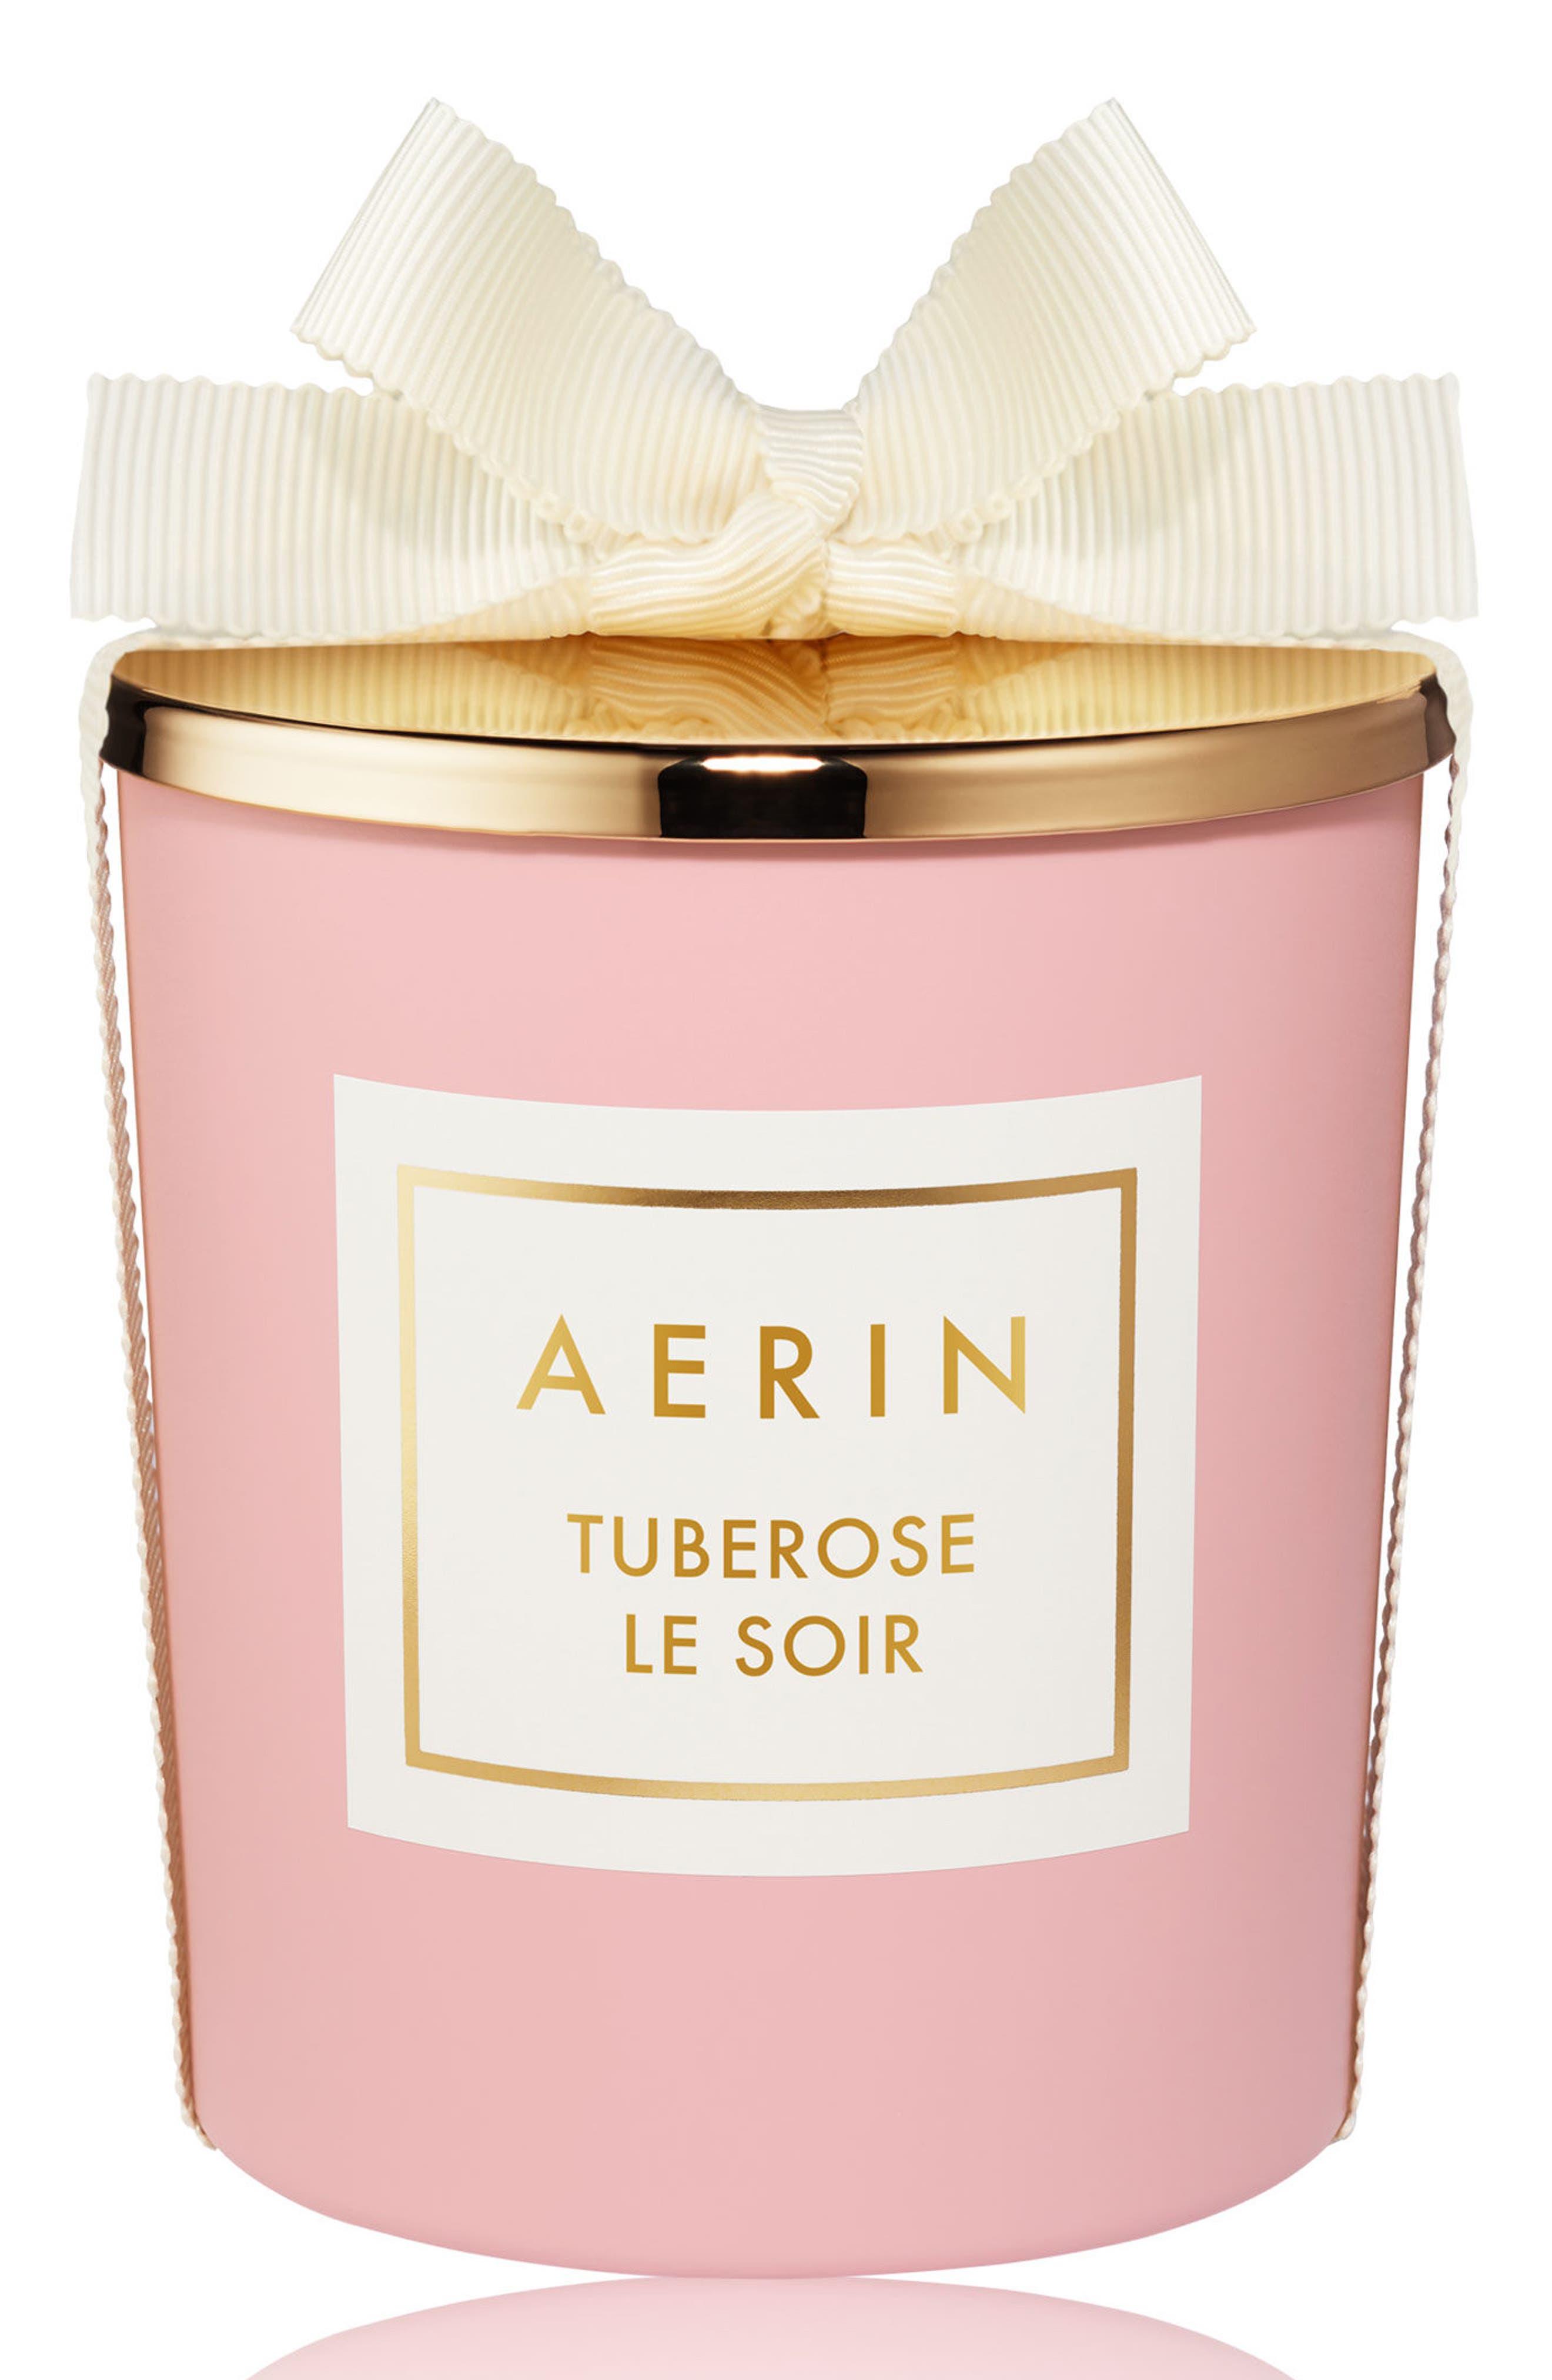 AERIN Beauty Tuberose Le Soir Candle,                             Main thumbnail 1, color,                             No Color